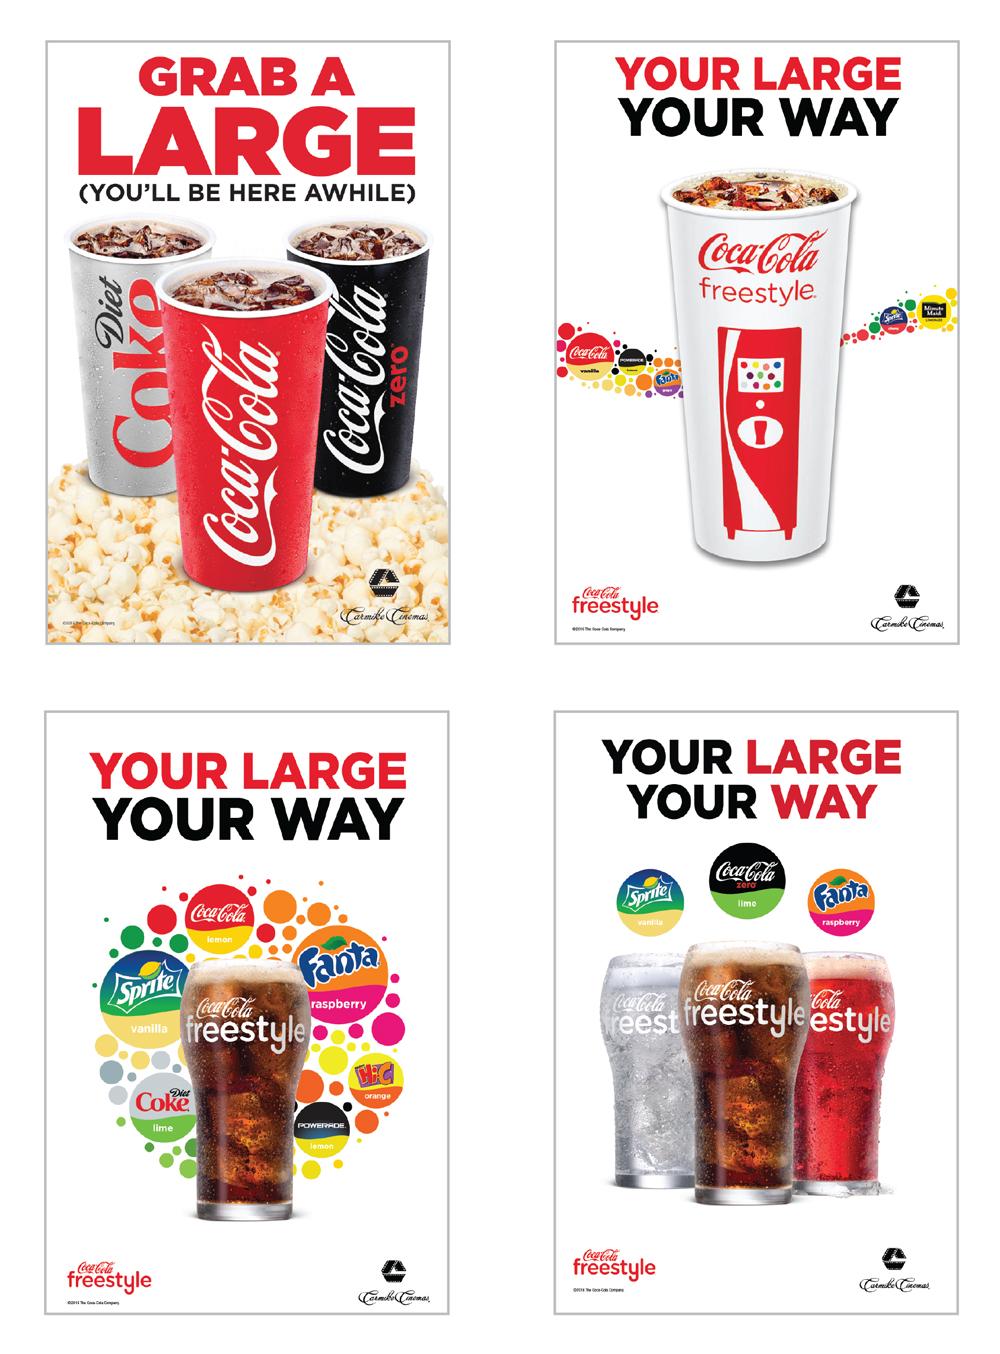 Client: Coca-Cola / Carmike Cinemas